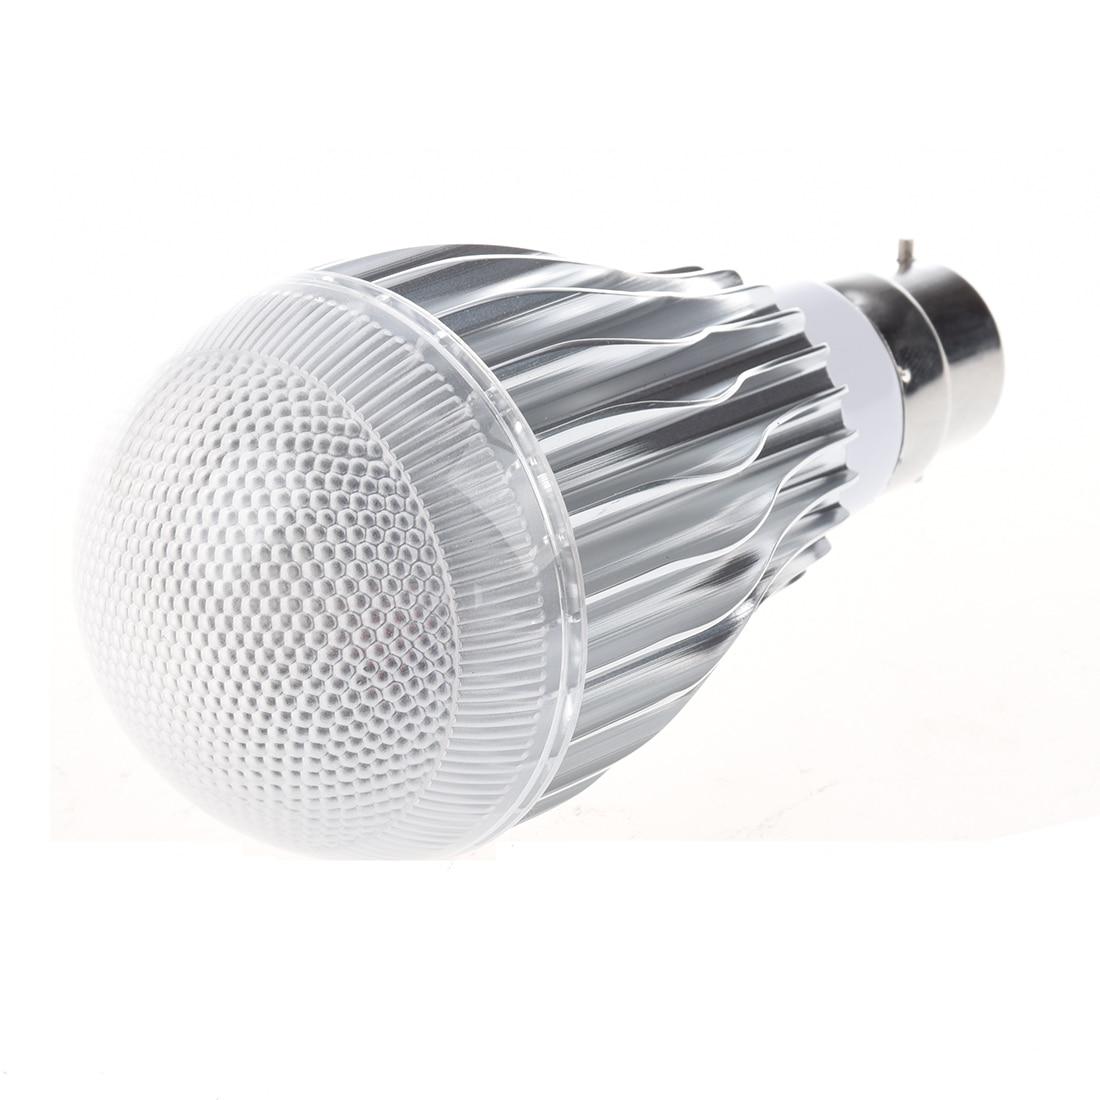 9W B22 100-240V Remote Control Color Changing RGB LED Light Bulb Lamp